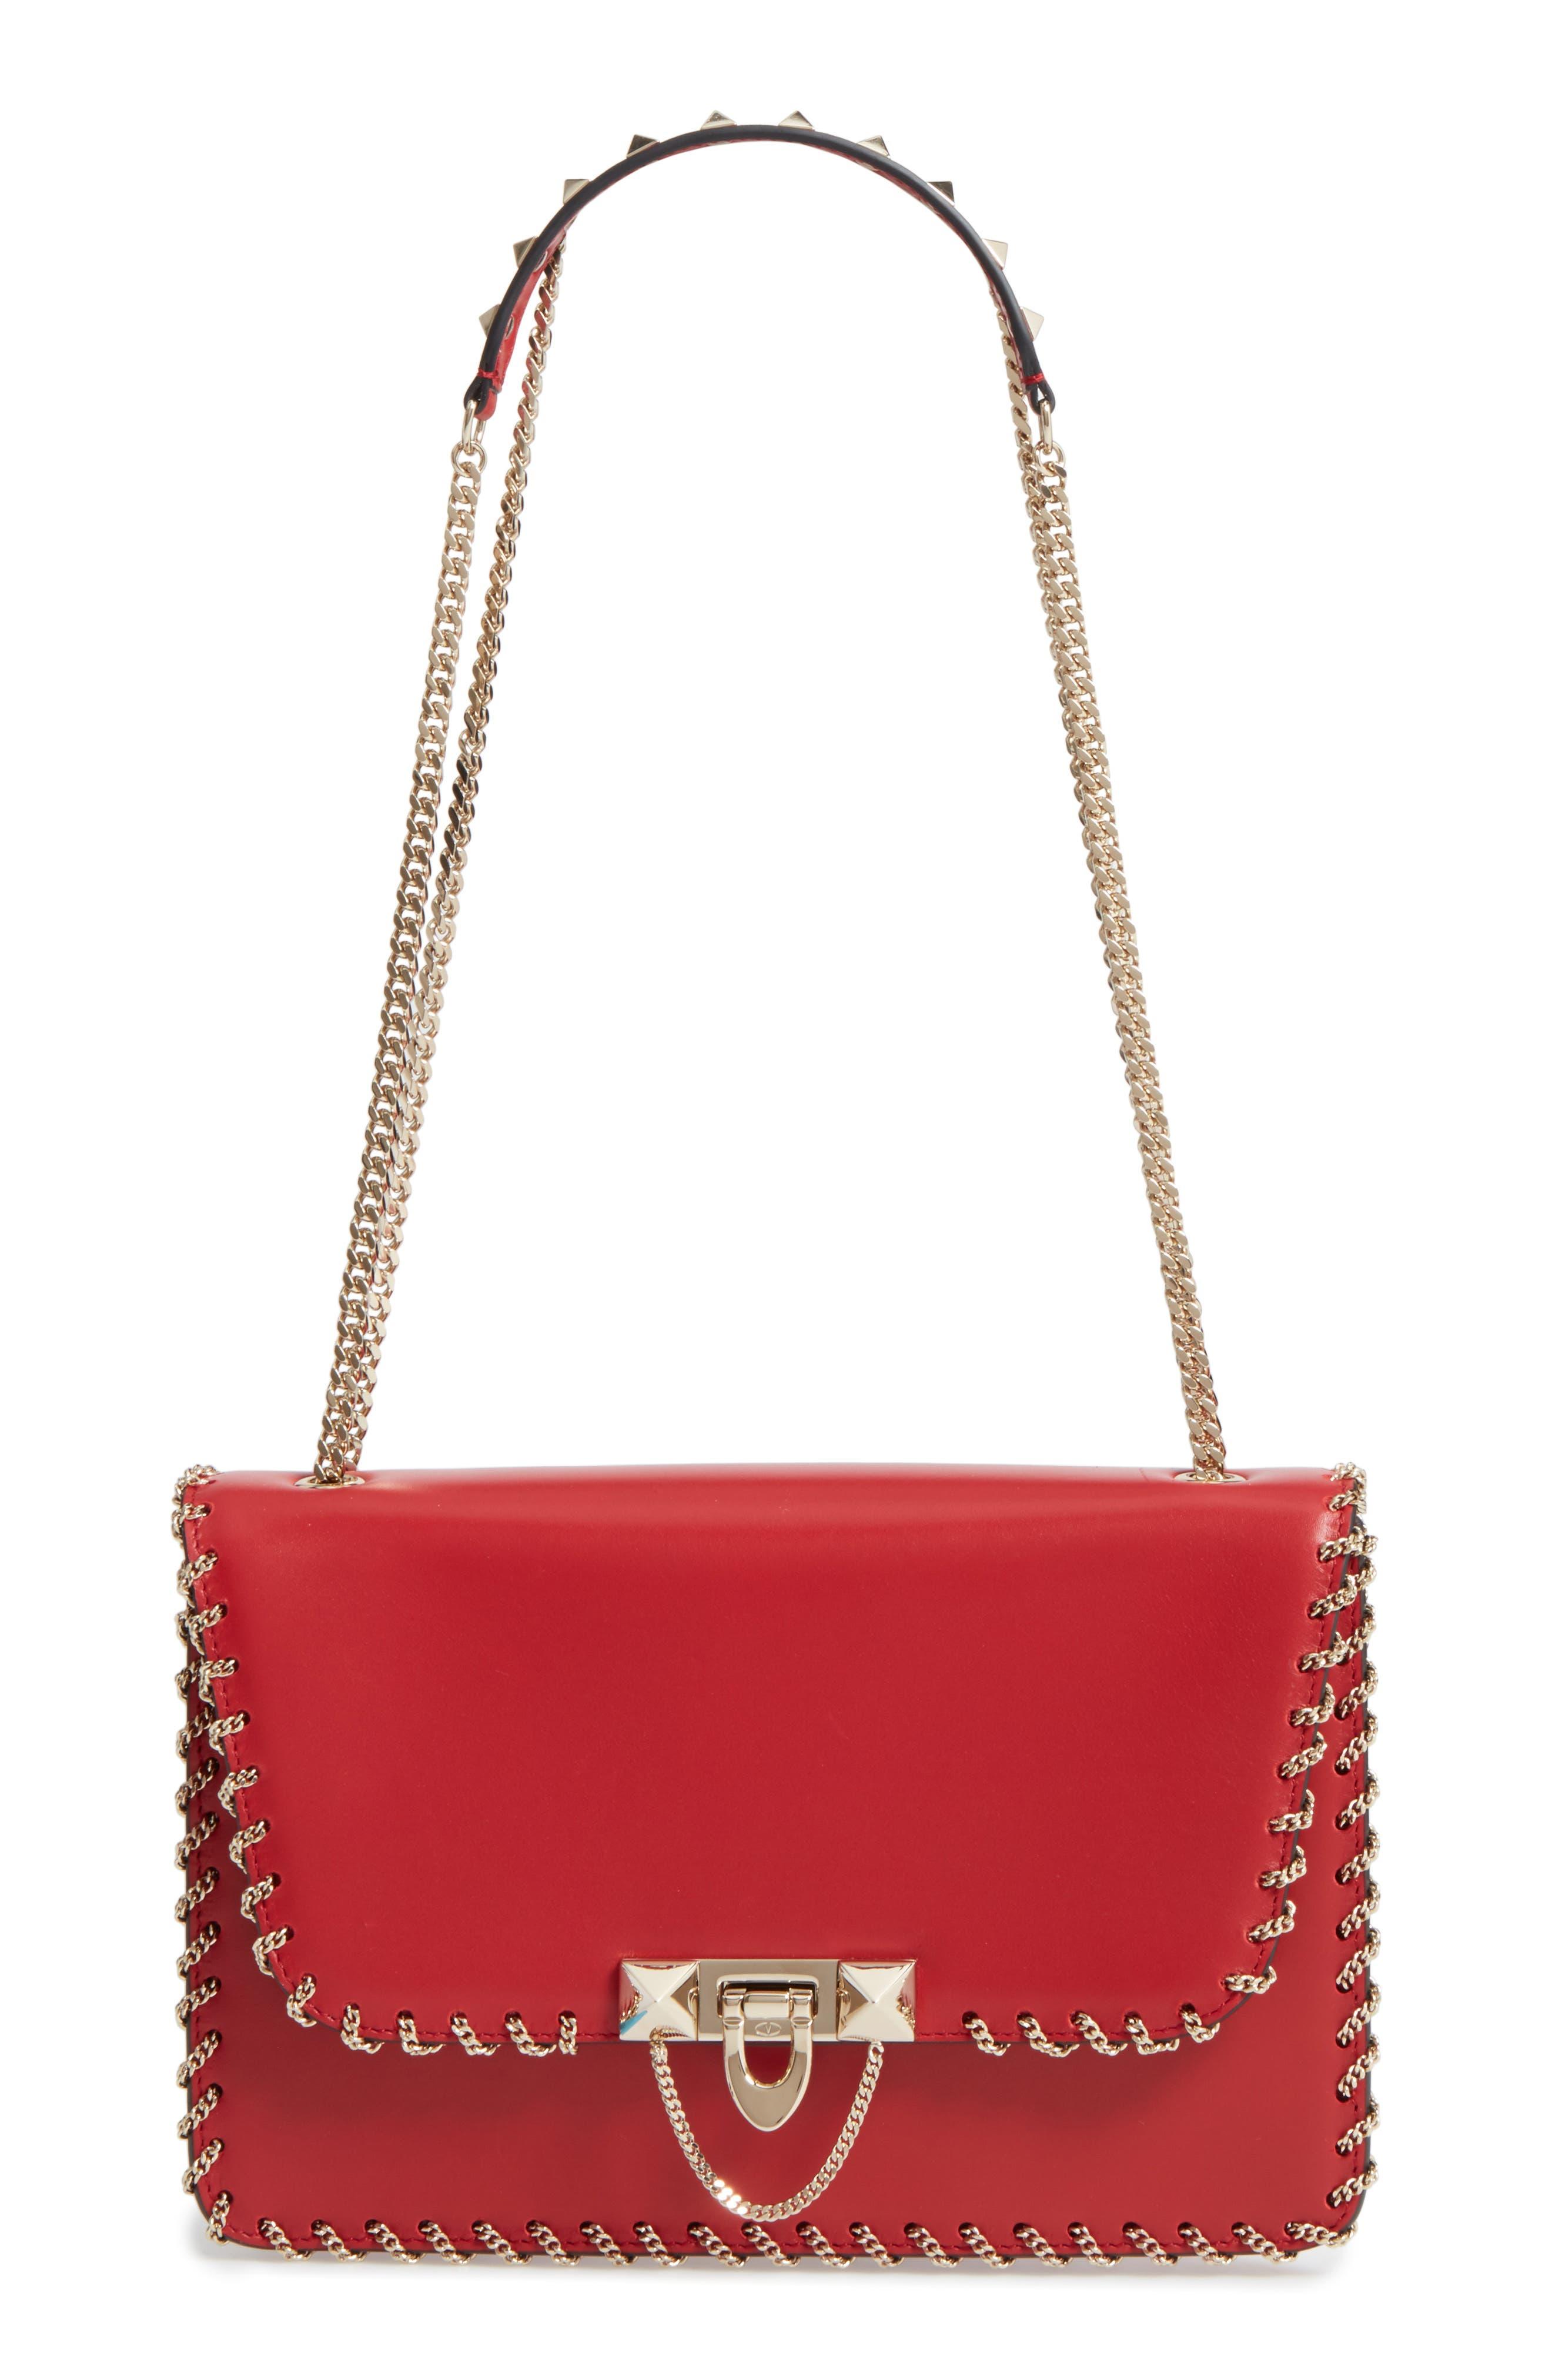 Main Image - VALENTINO GARAVANI Demilune Whipstitch Leather Shoulder Bag